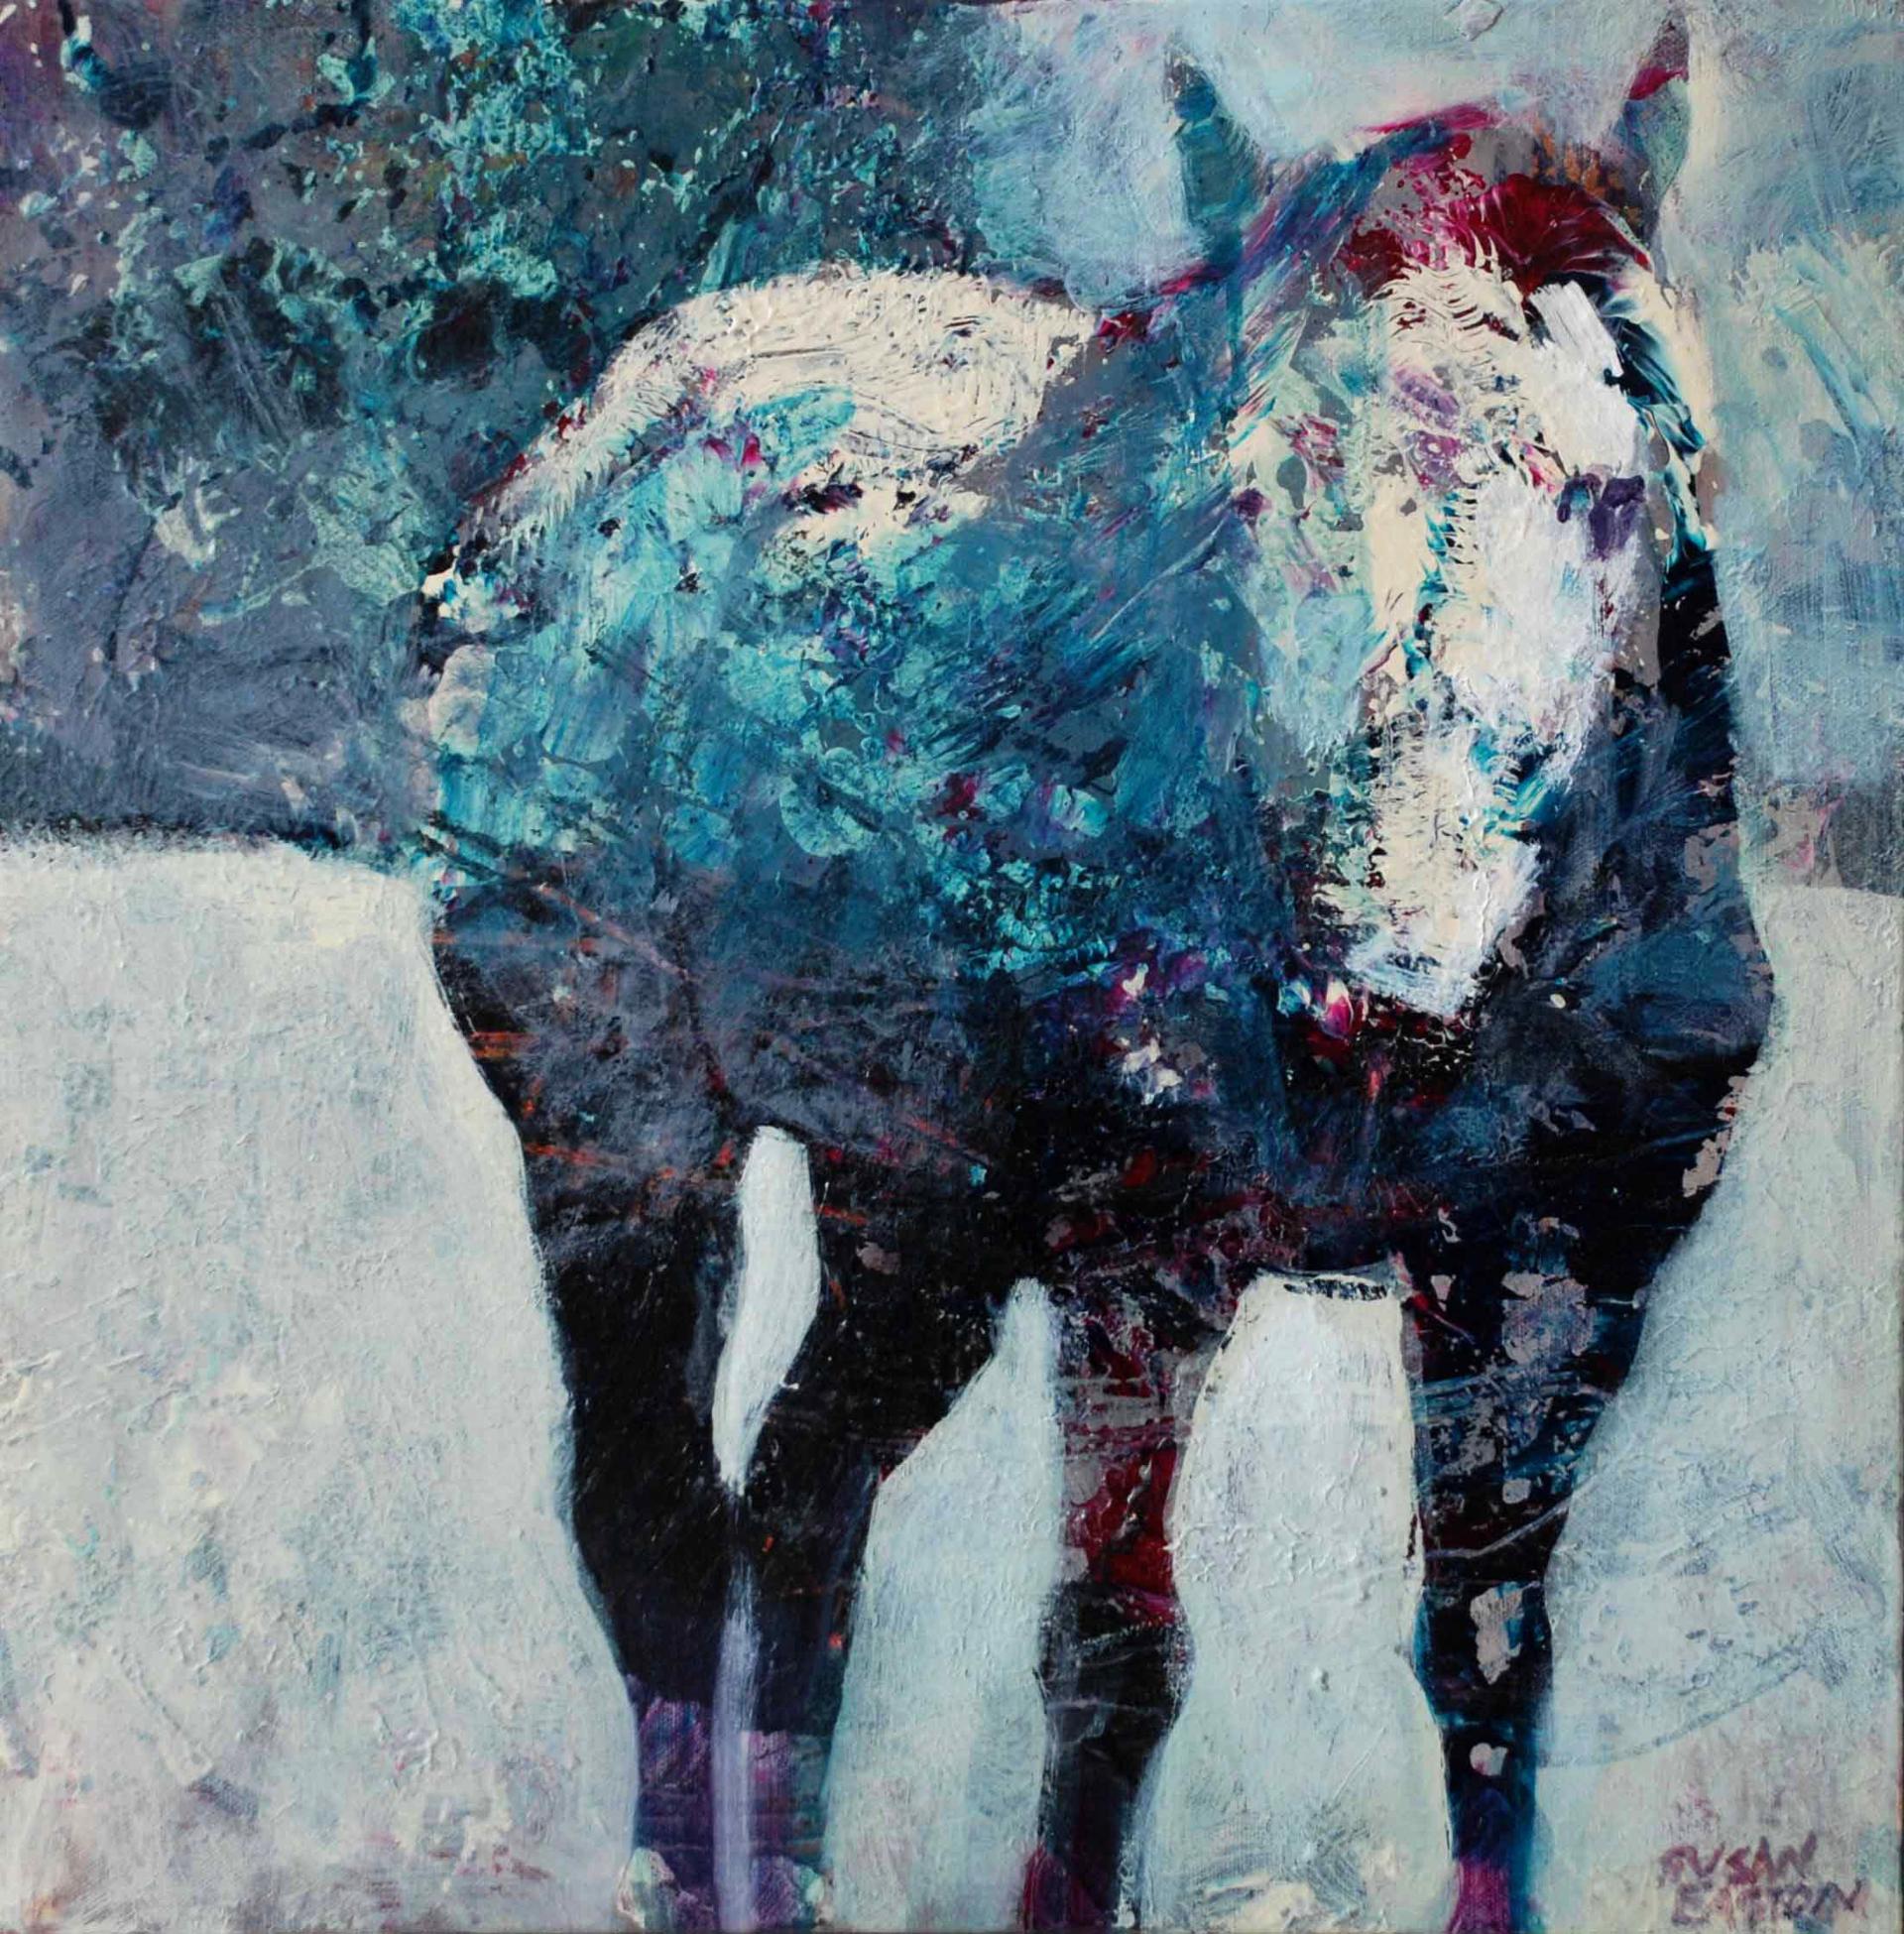 Inner by Susan Easton Burns